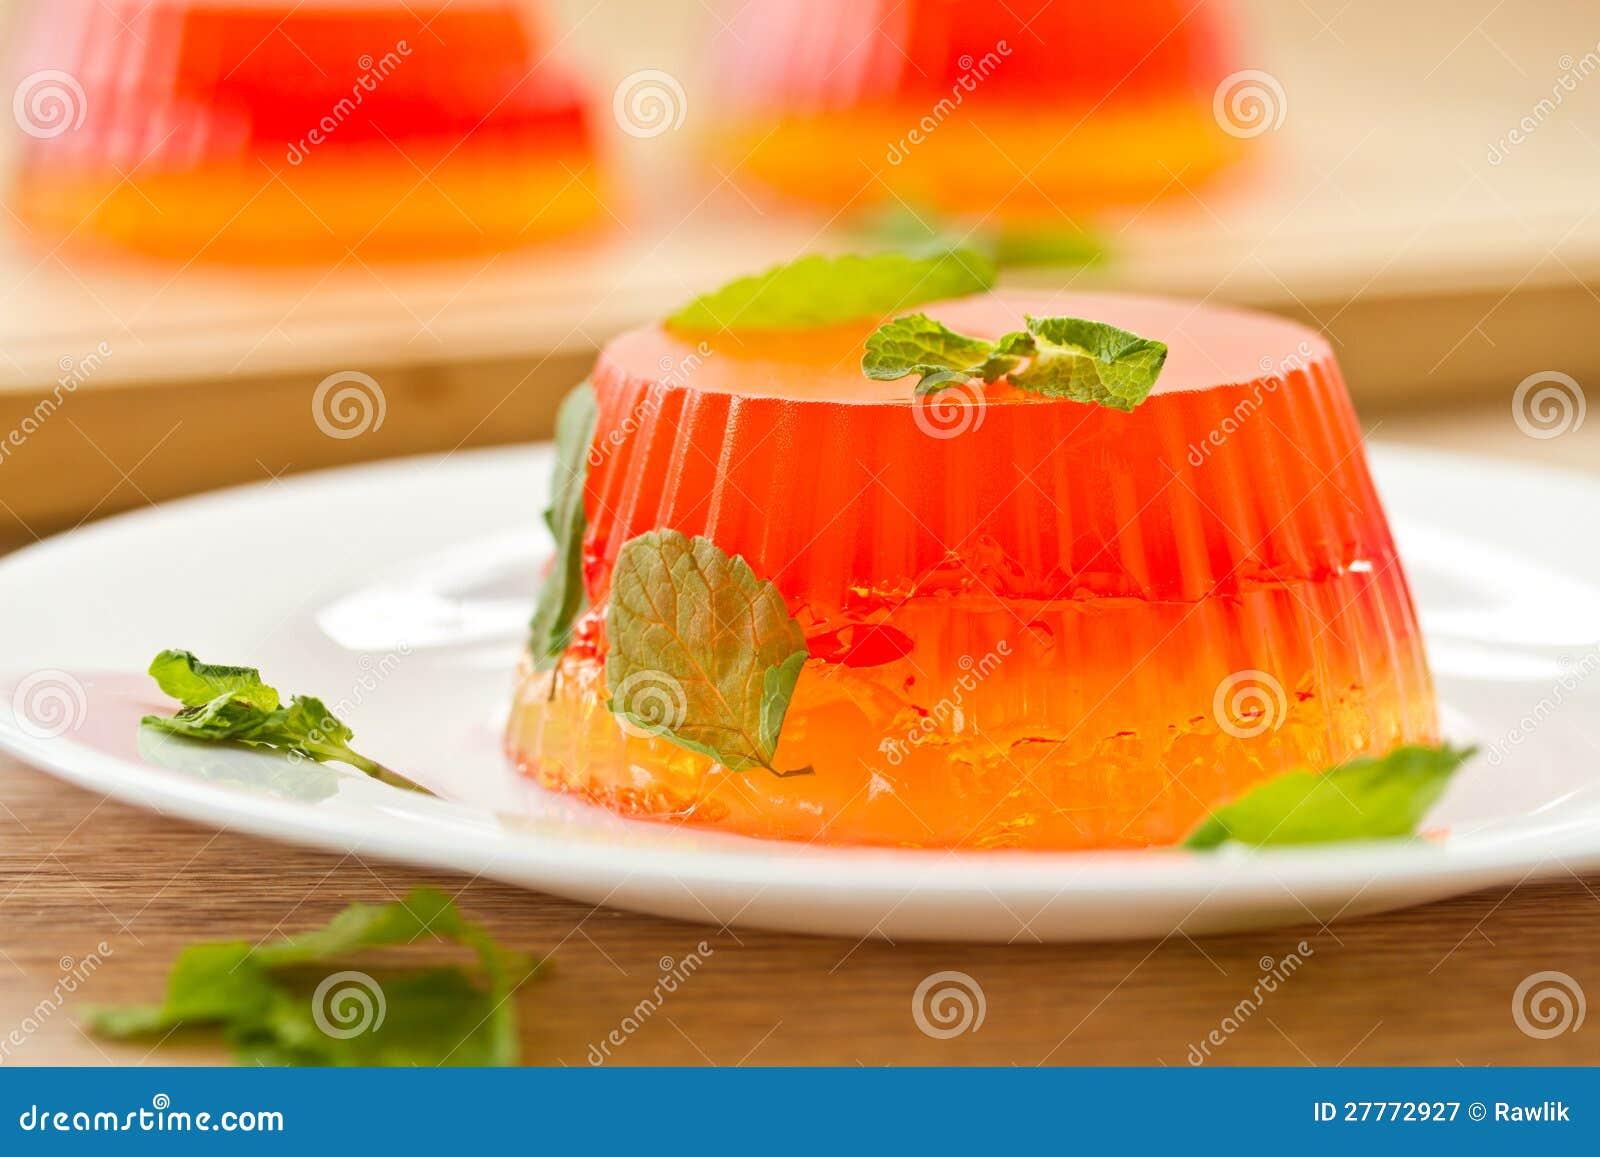 Fruit Jellies Royalty Free Stock Photography - Image: 27772927